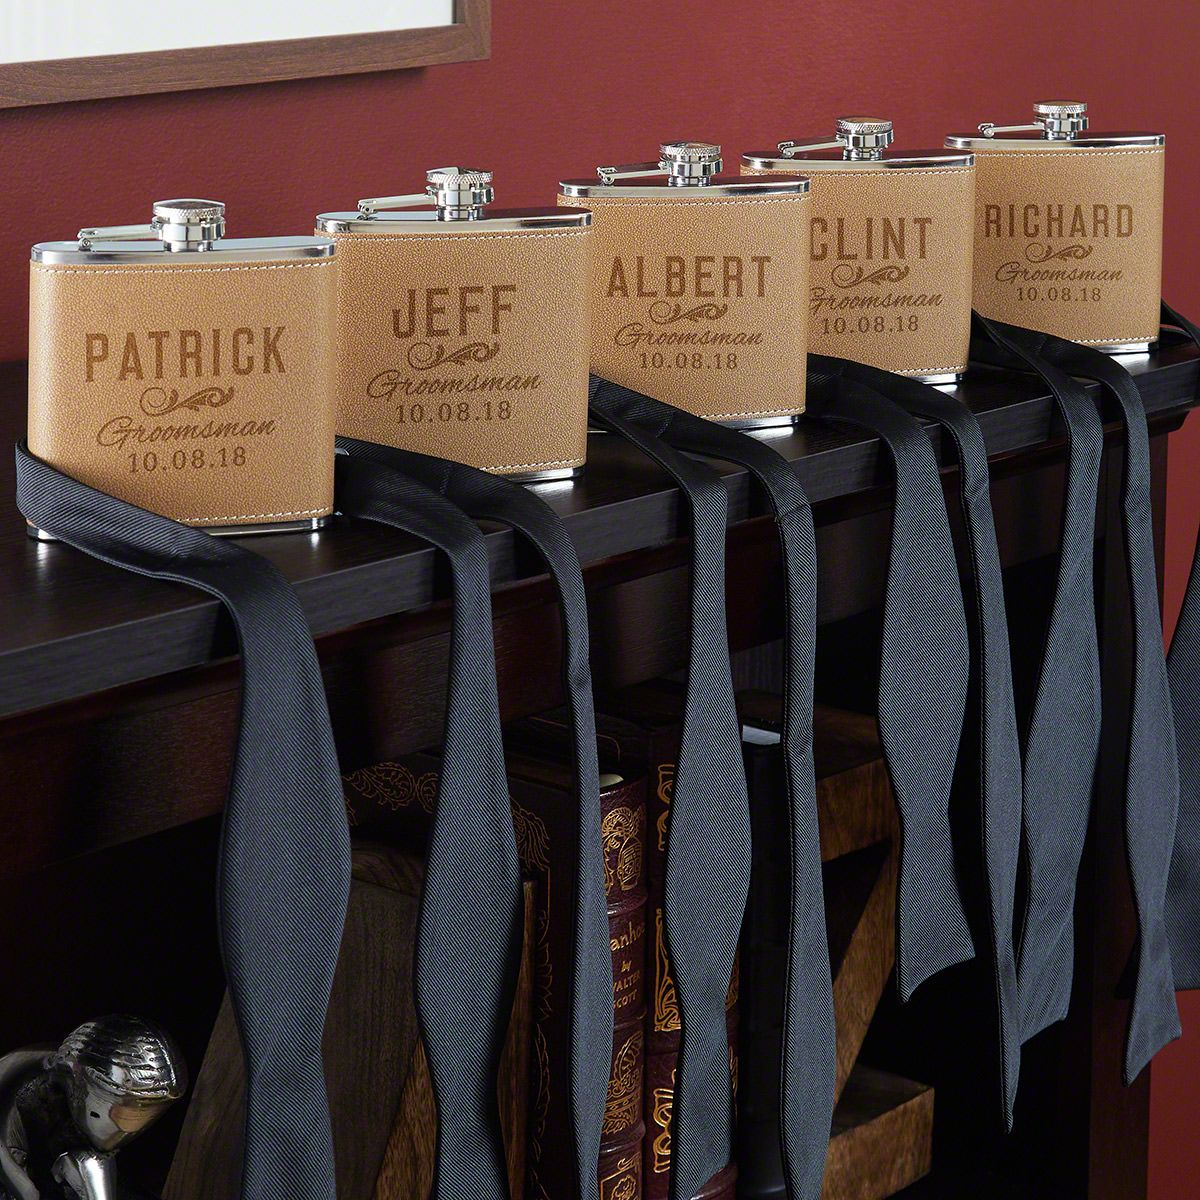 Classic Groomsman Custom Cocoa Leather Flasks – Set of 5 Groomsmen Flasks